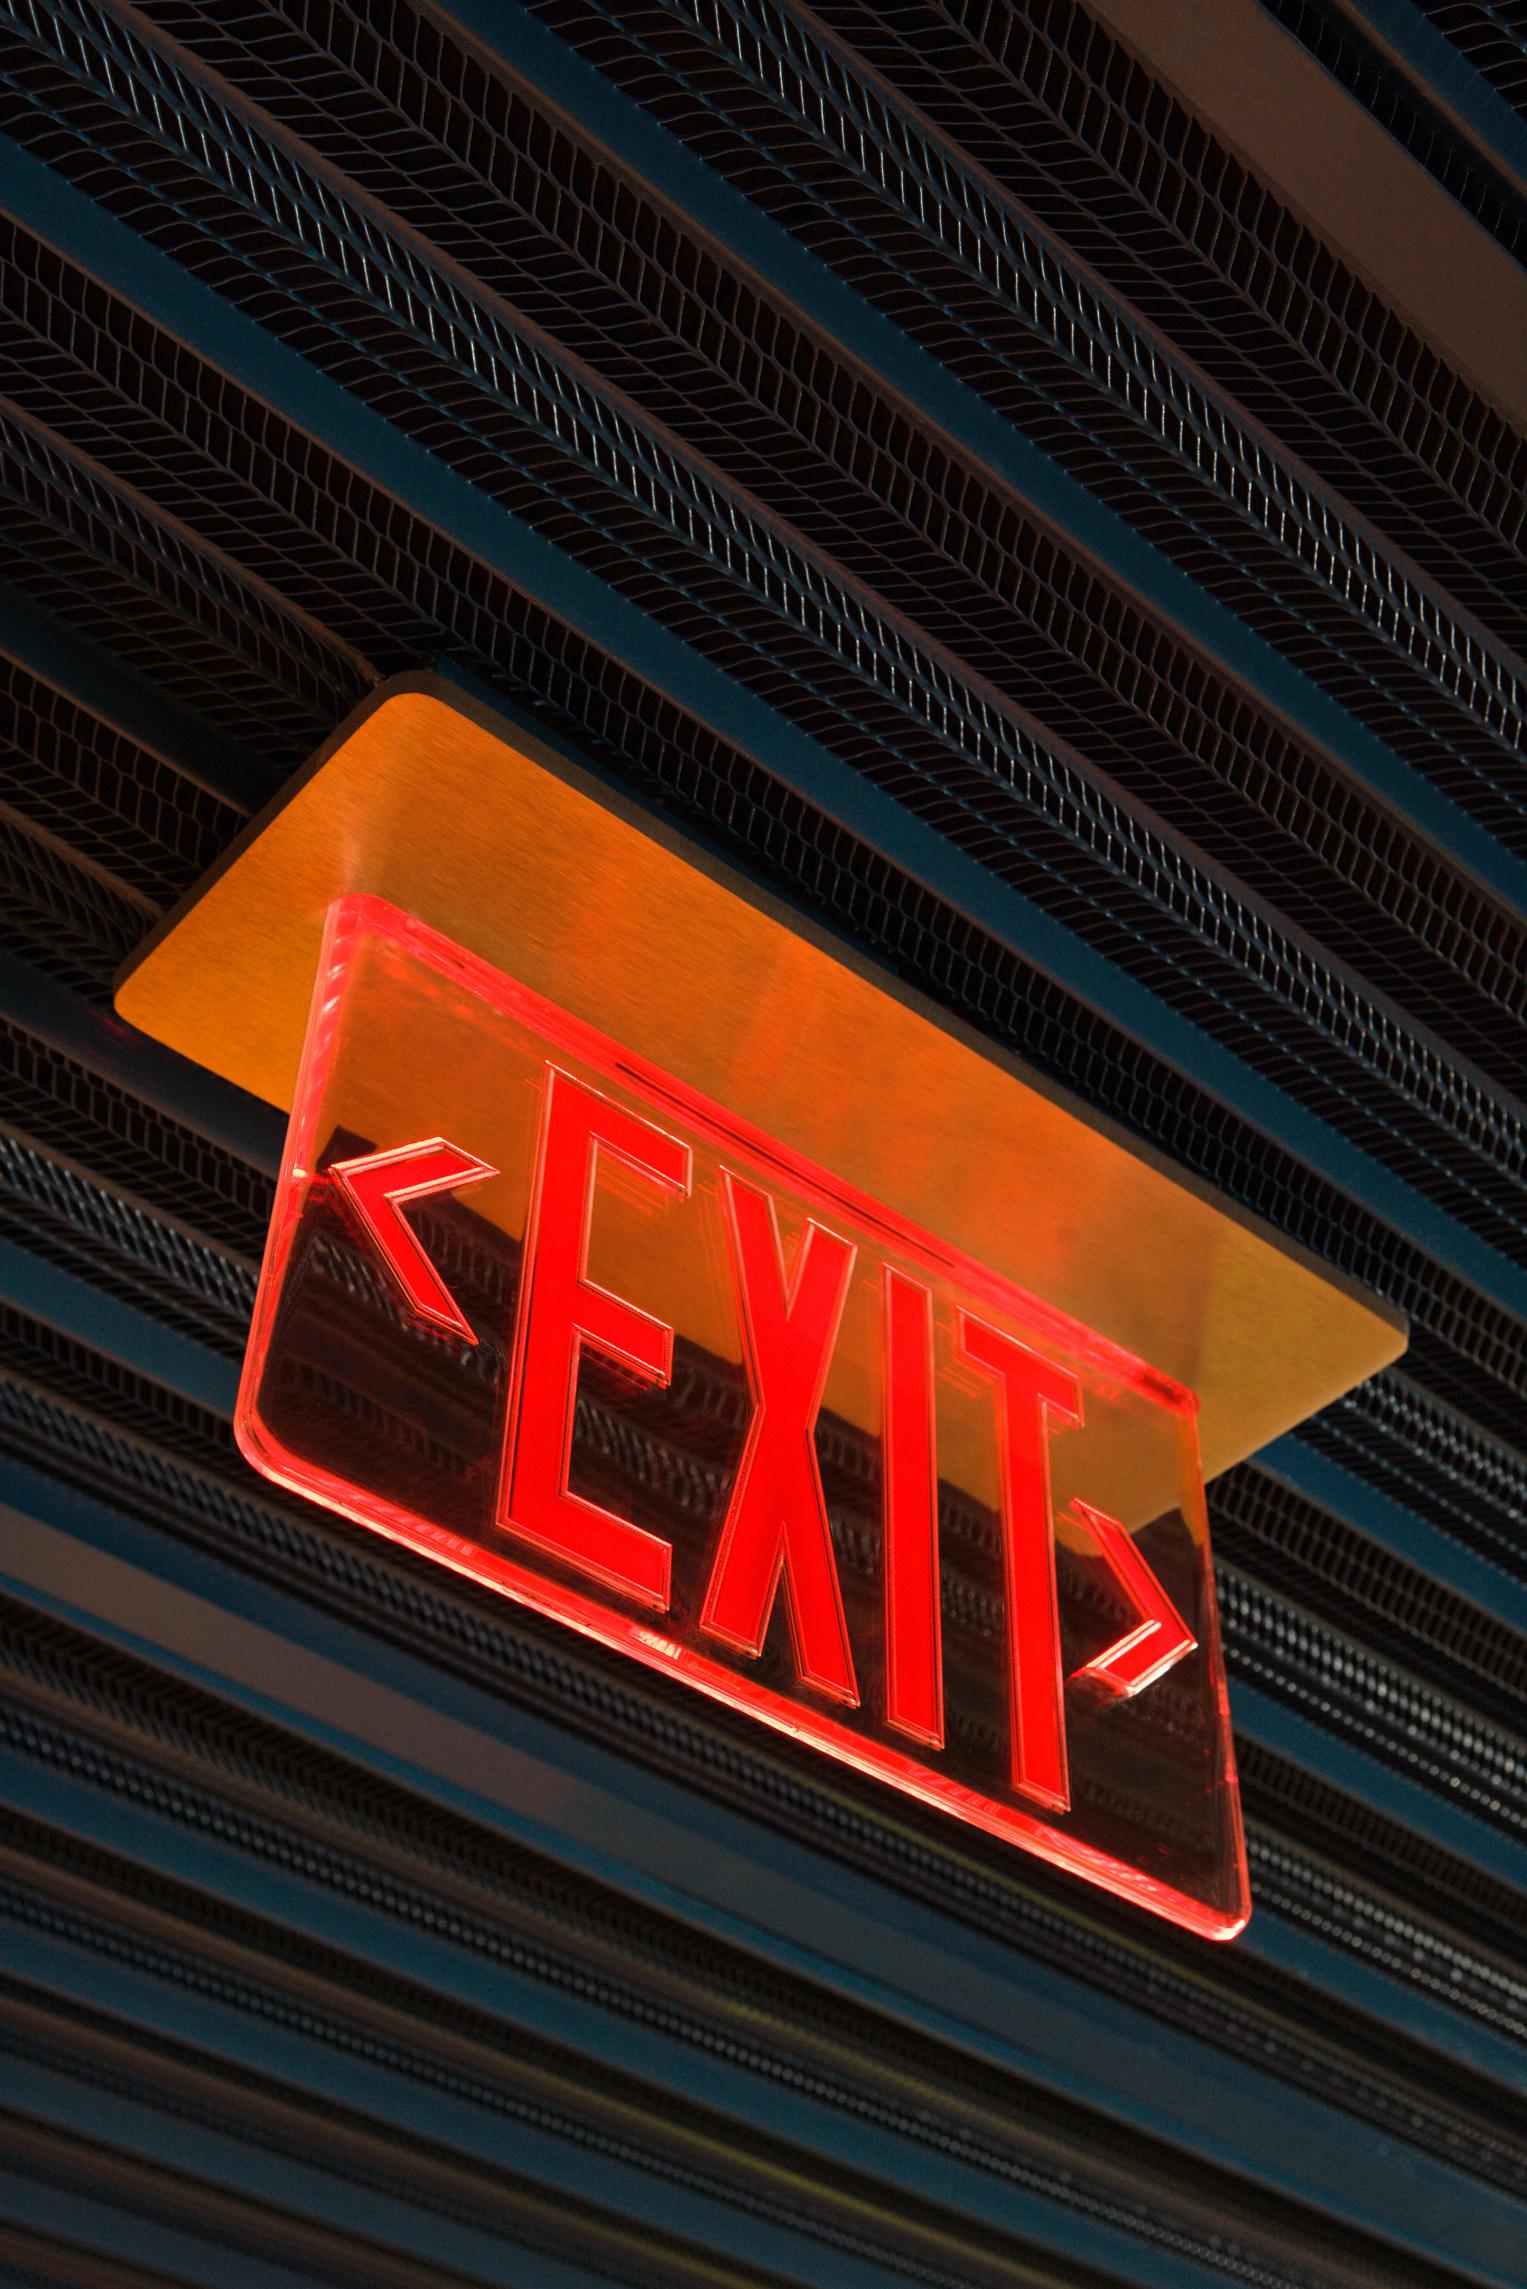 How to Make Edge-Lit LED Signs | Bizfluent